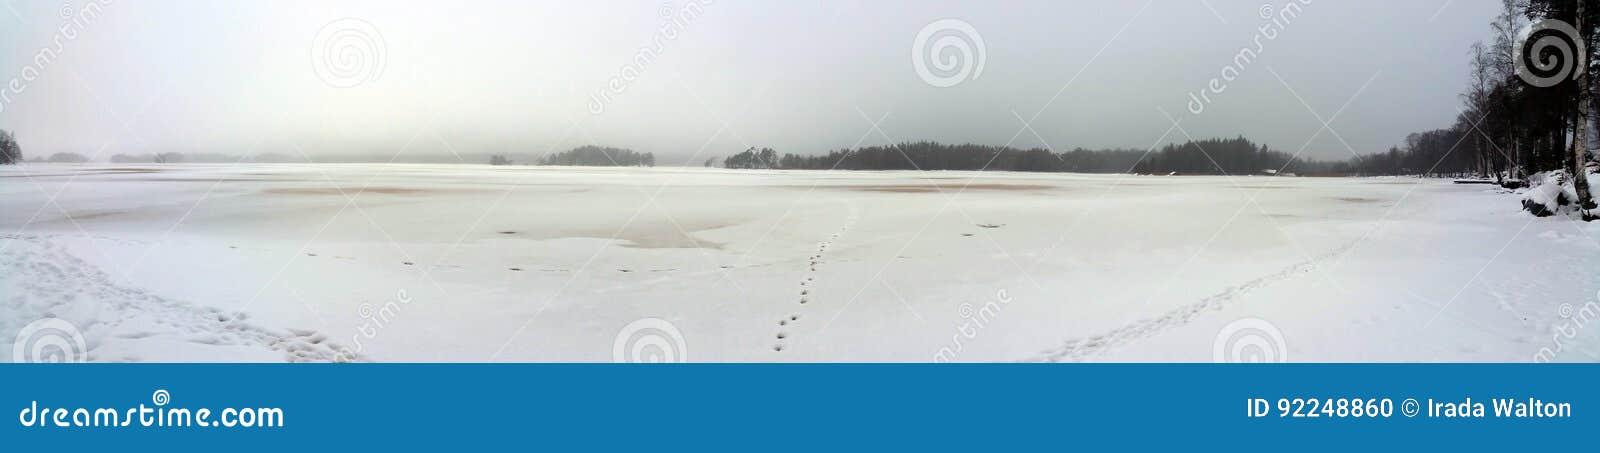 湖边在冬天